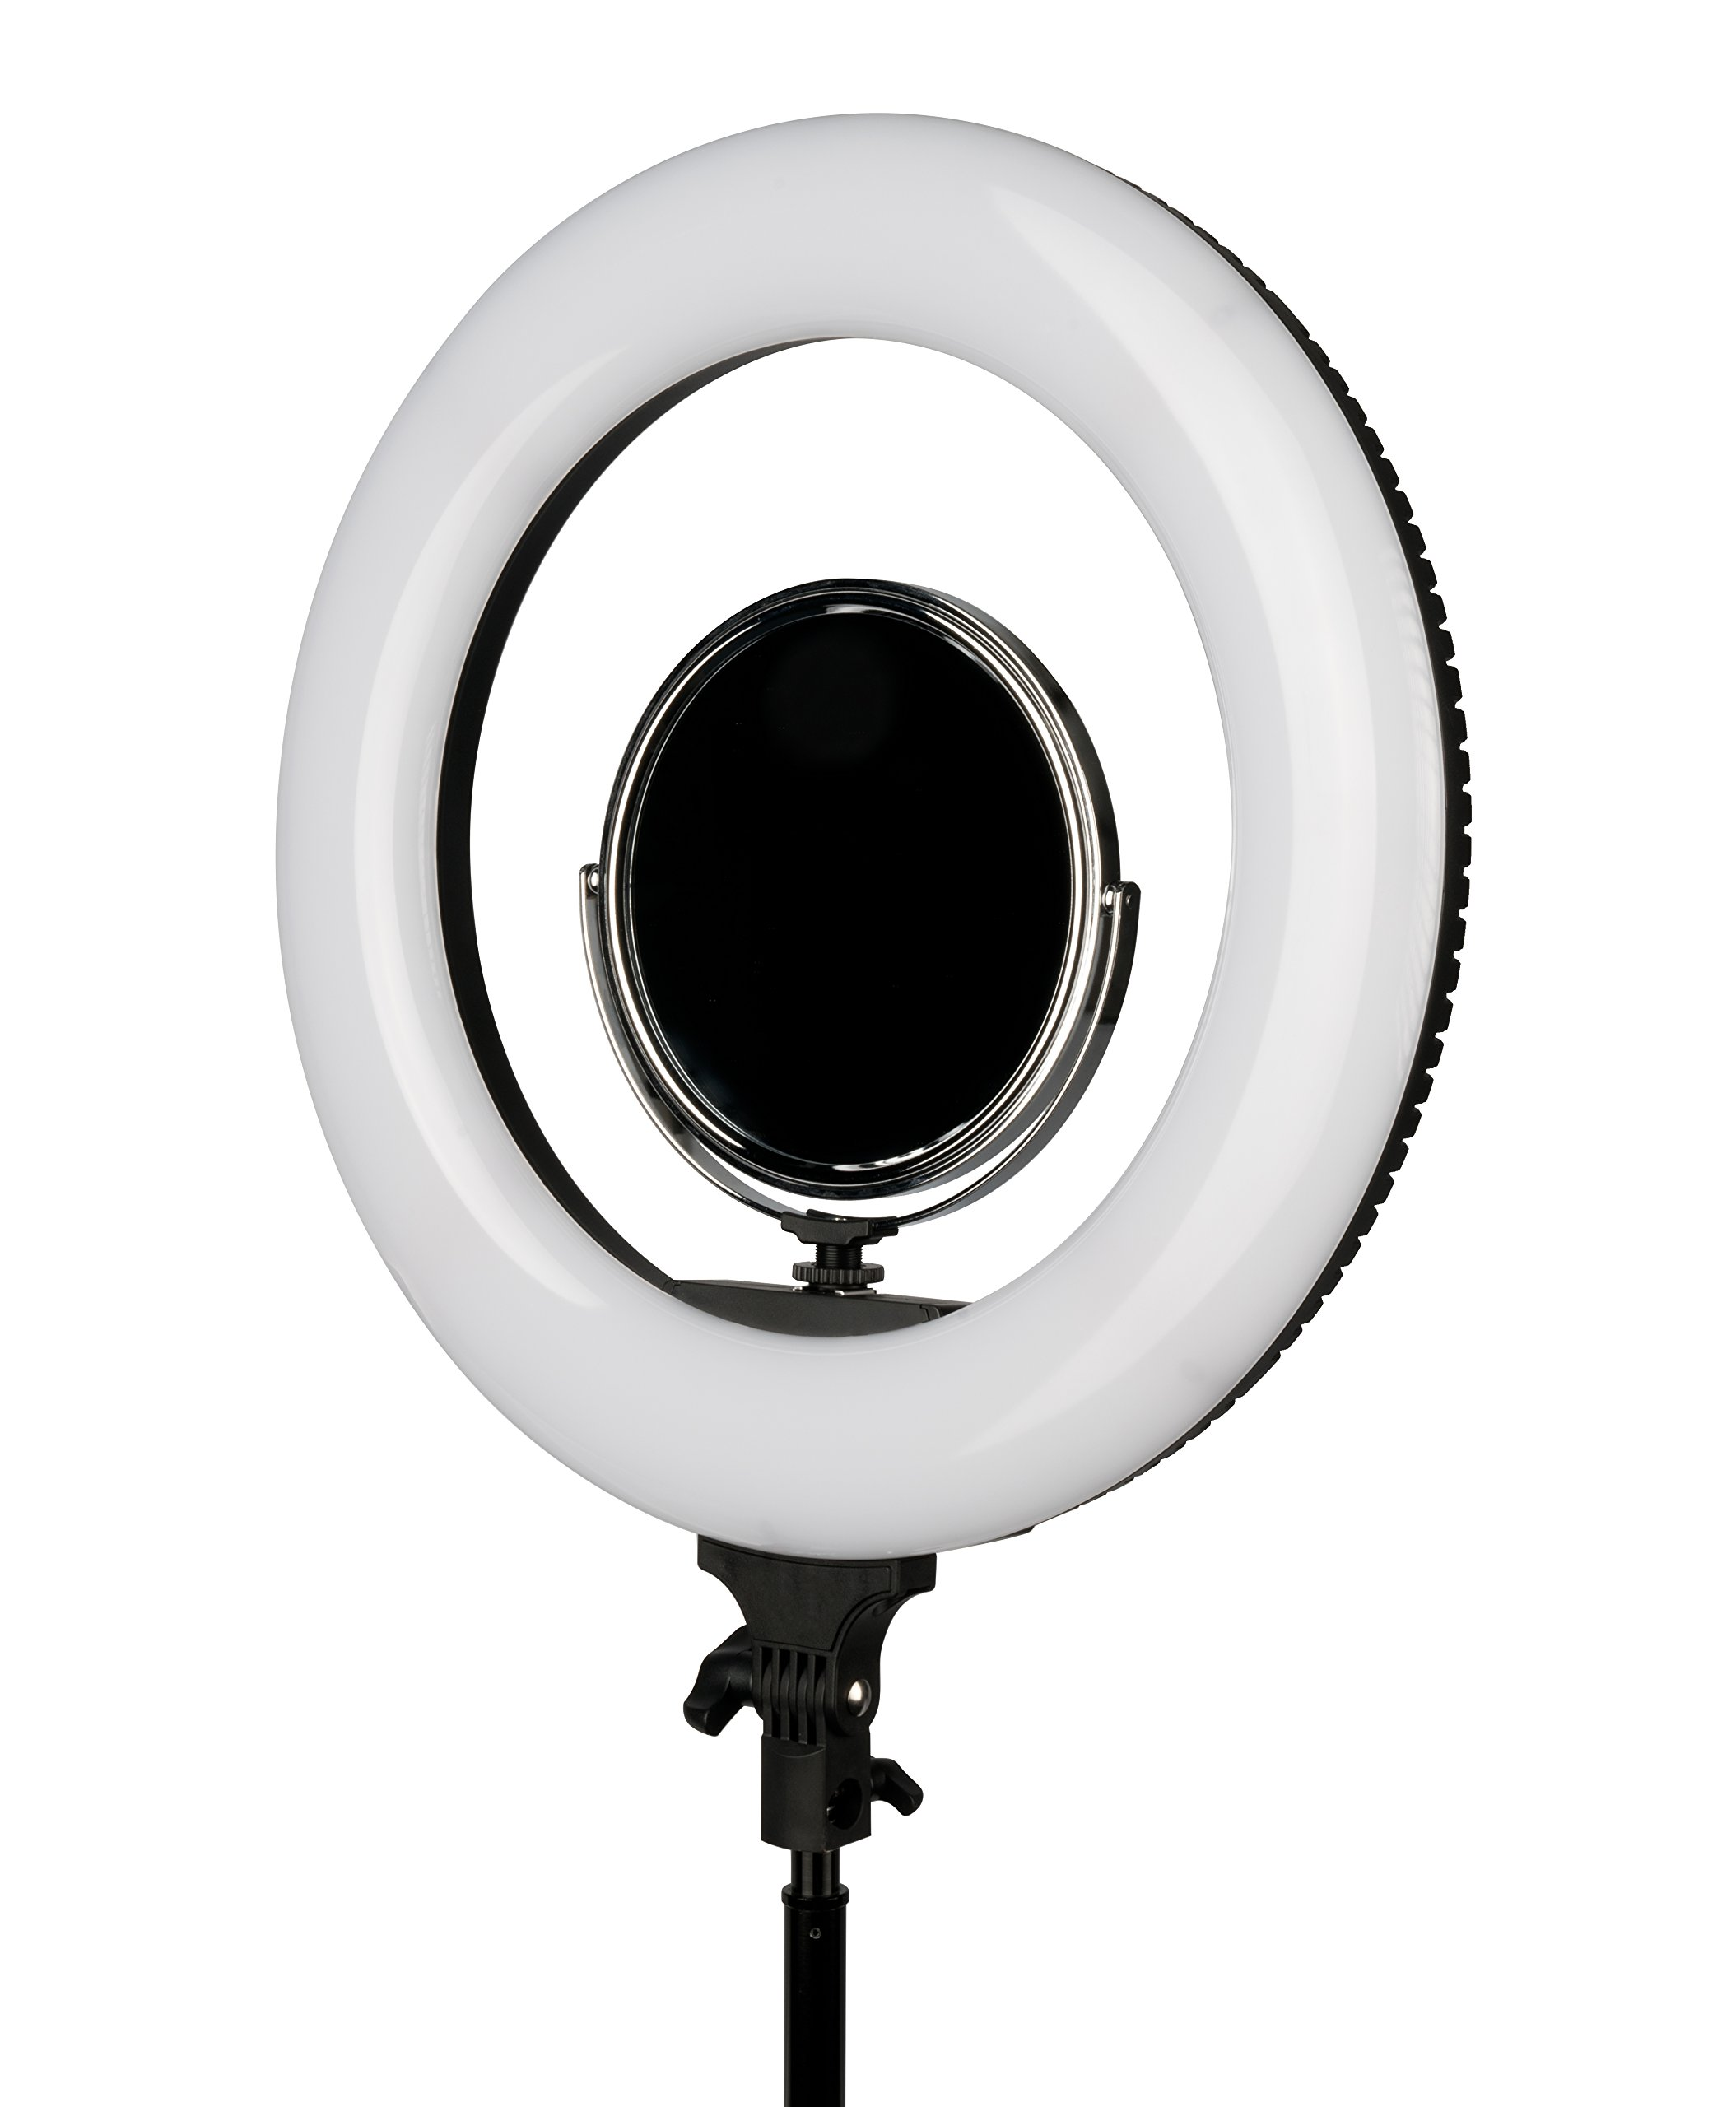 Ikan RLCB60 Oryon 18'' Bi-Color Led Cosmetic Ring Light by Ikan